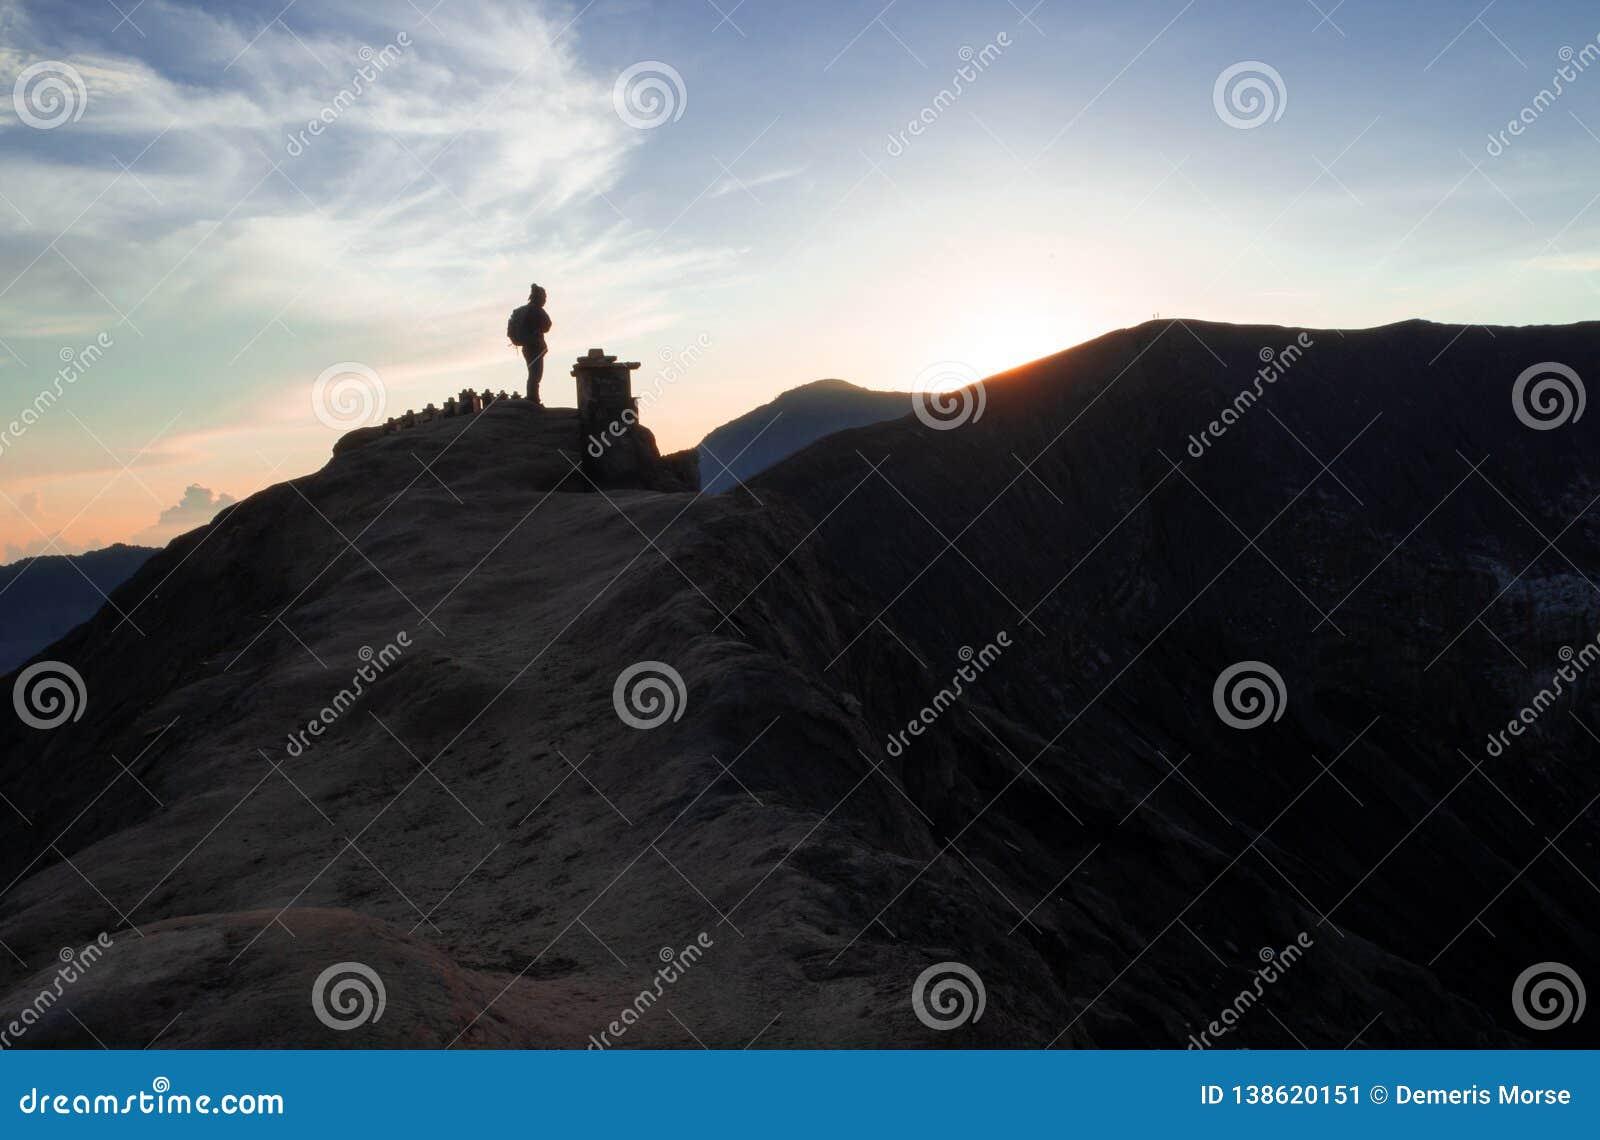 Fotvandraren håller ögonen på soluppgång över monteringen Bromo, Java, Indonesien